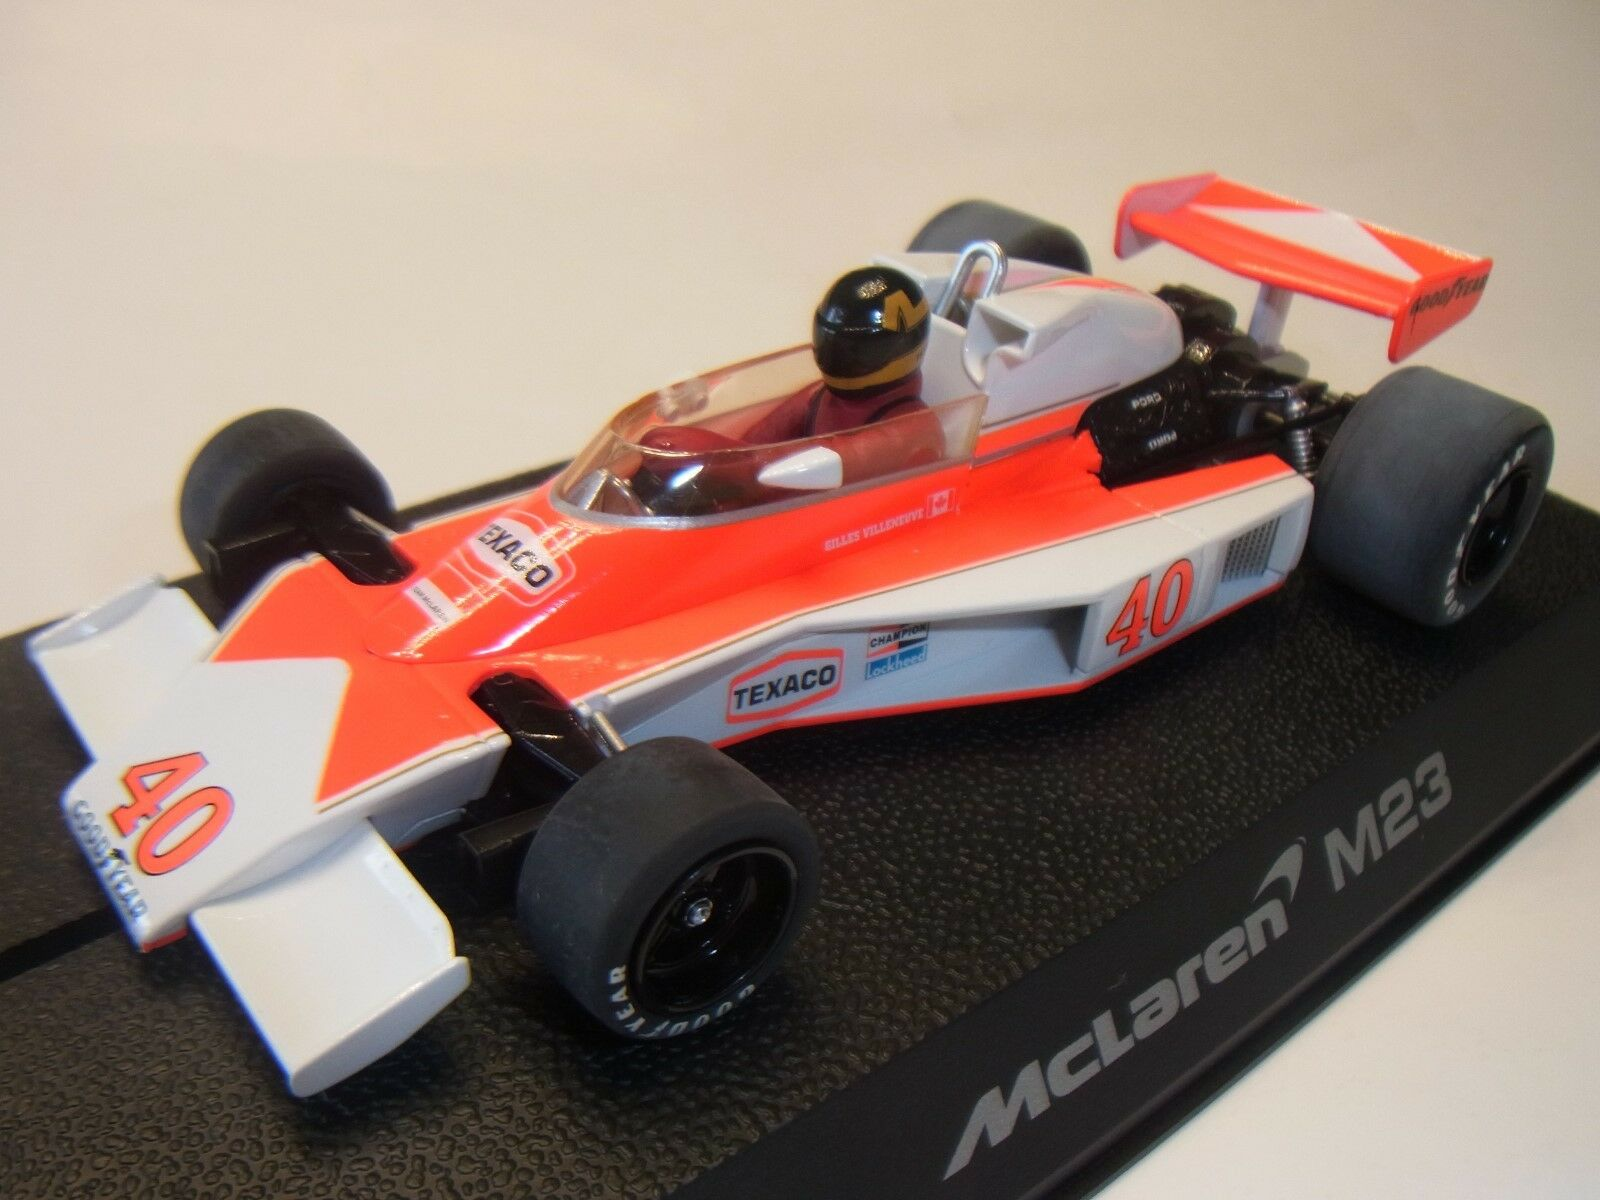 Scalextric Mclaren M23 Villeneuve C2800 para Circuito de Coches Slot 1  3 2